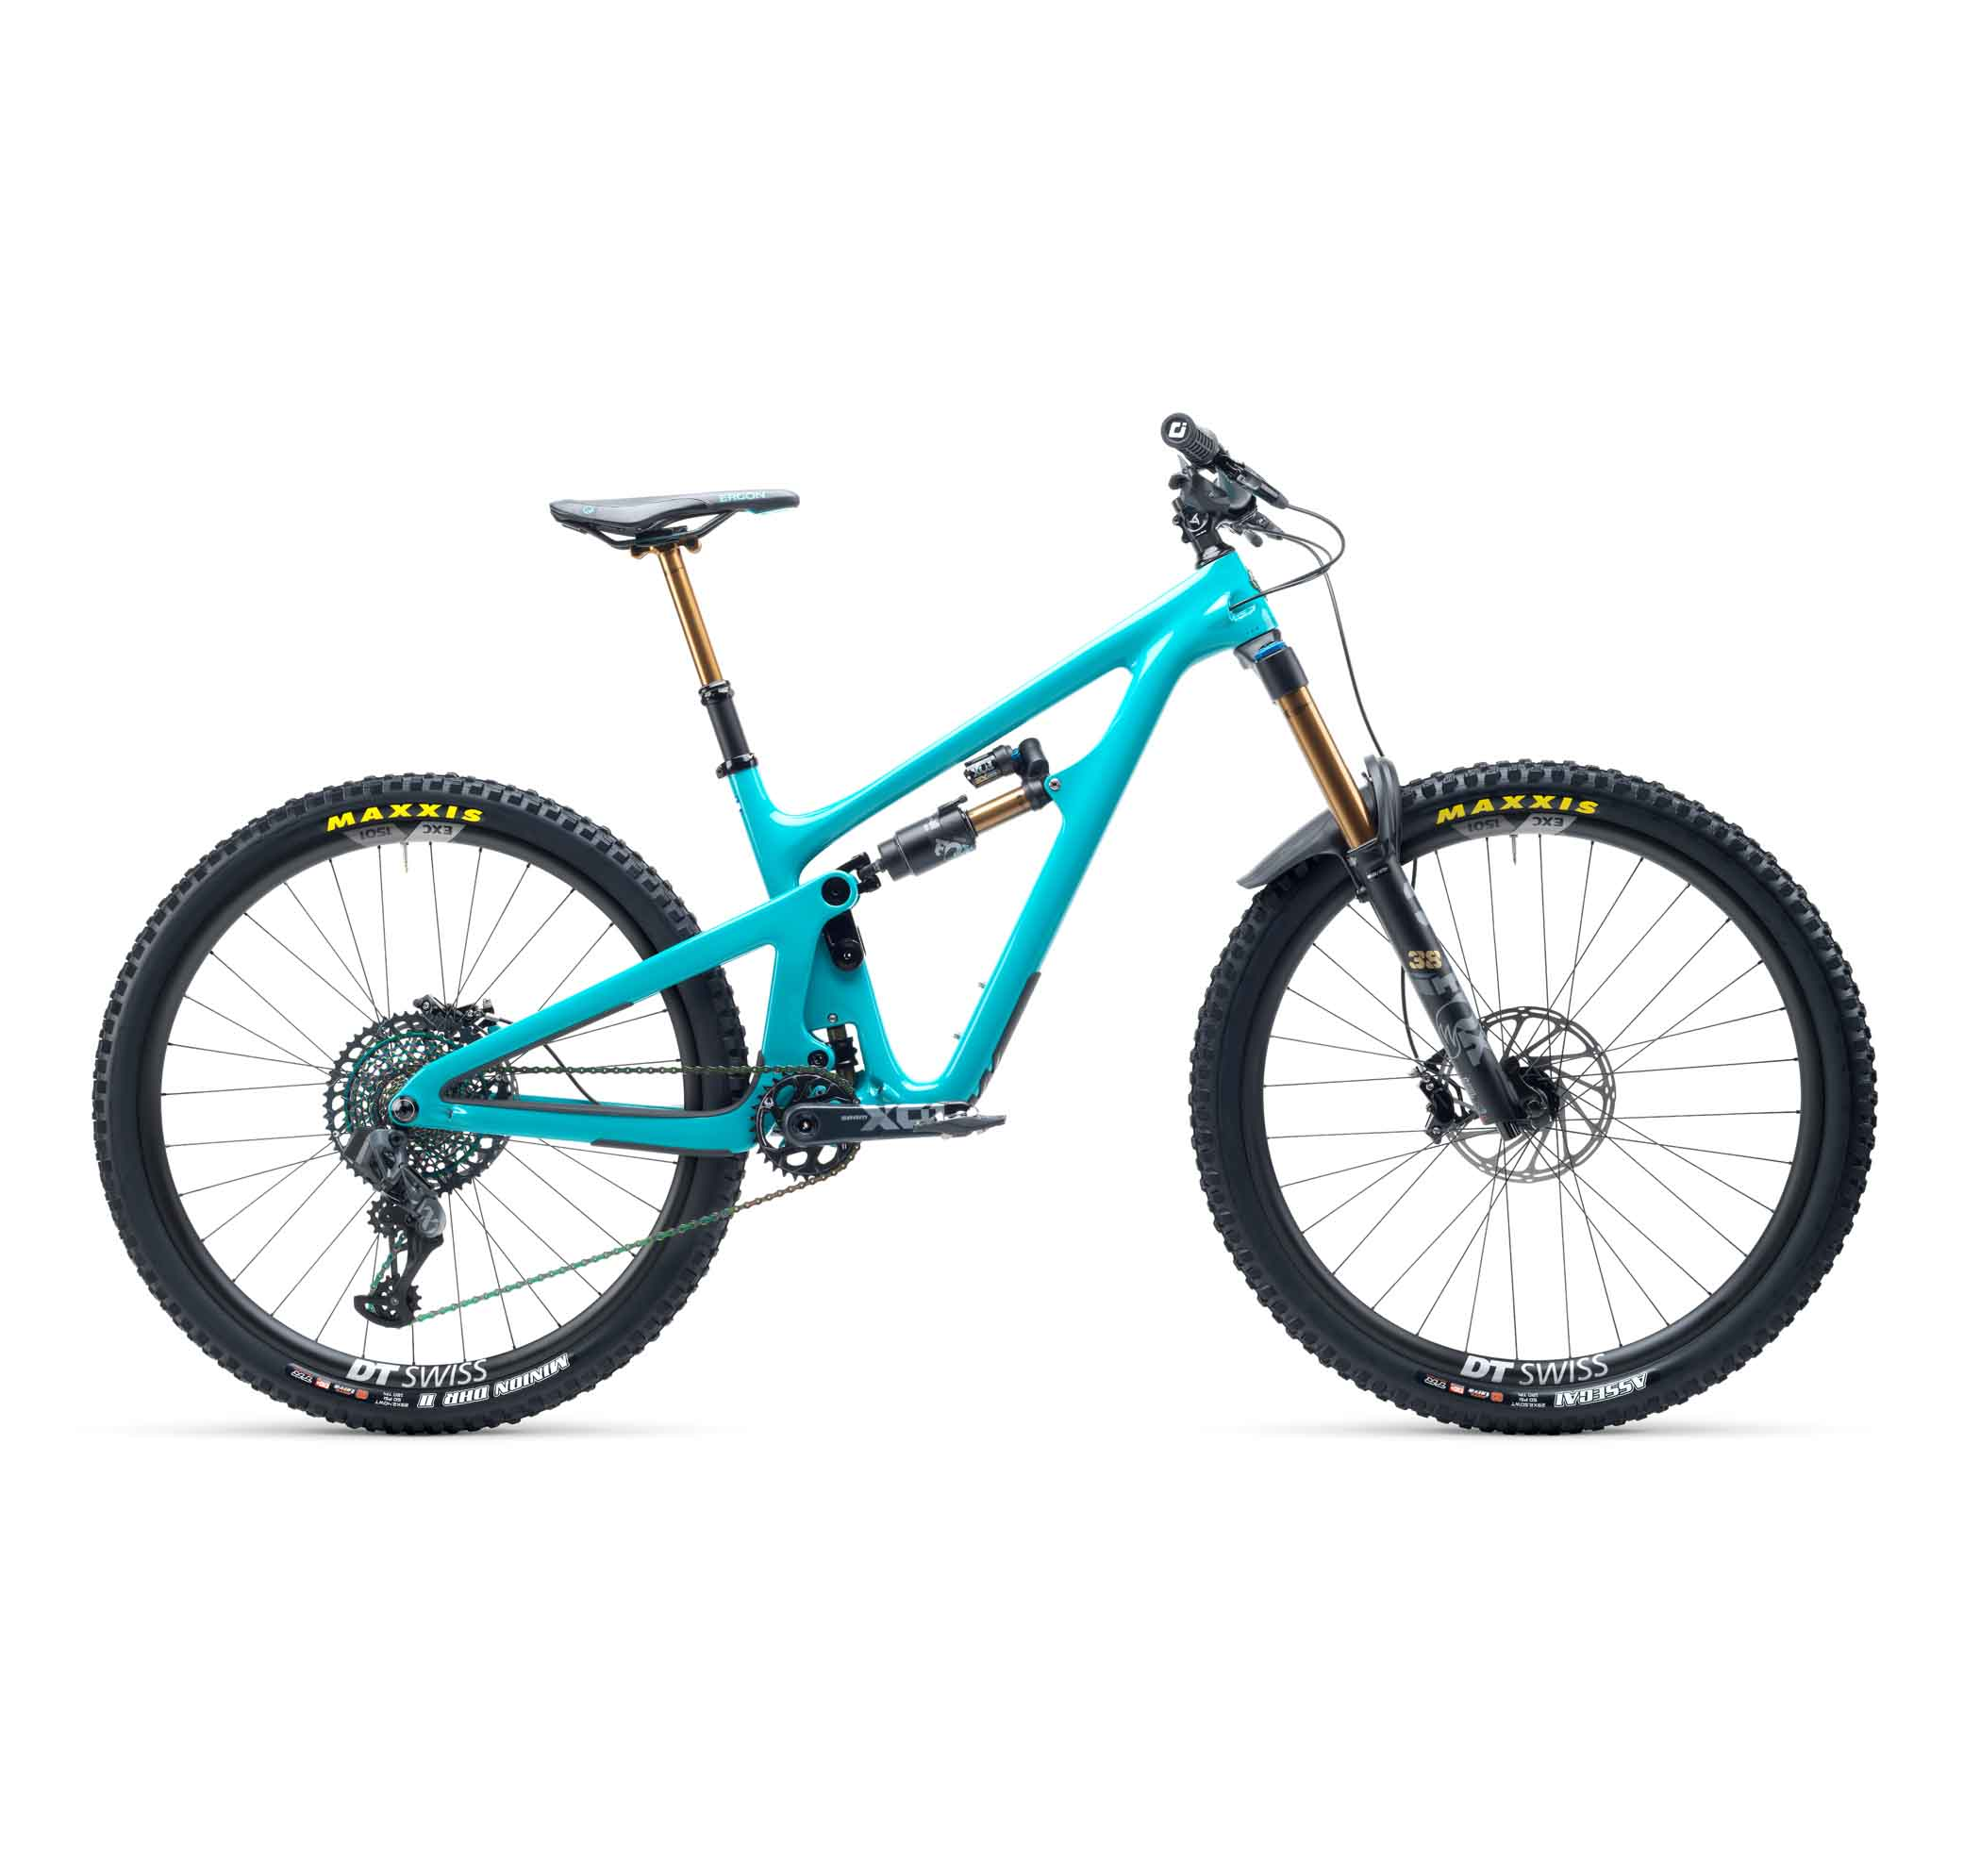 Yeti_Cycles_Rodeo_Bike_SB150_Turquoise